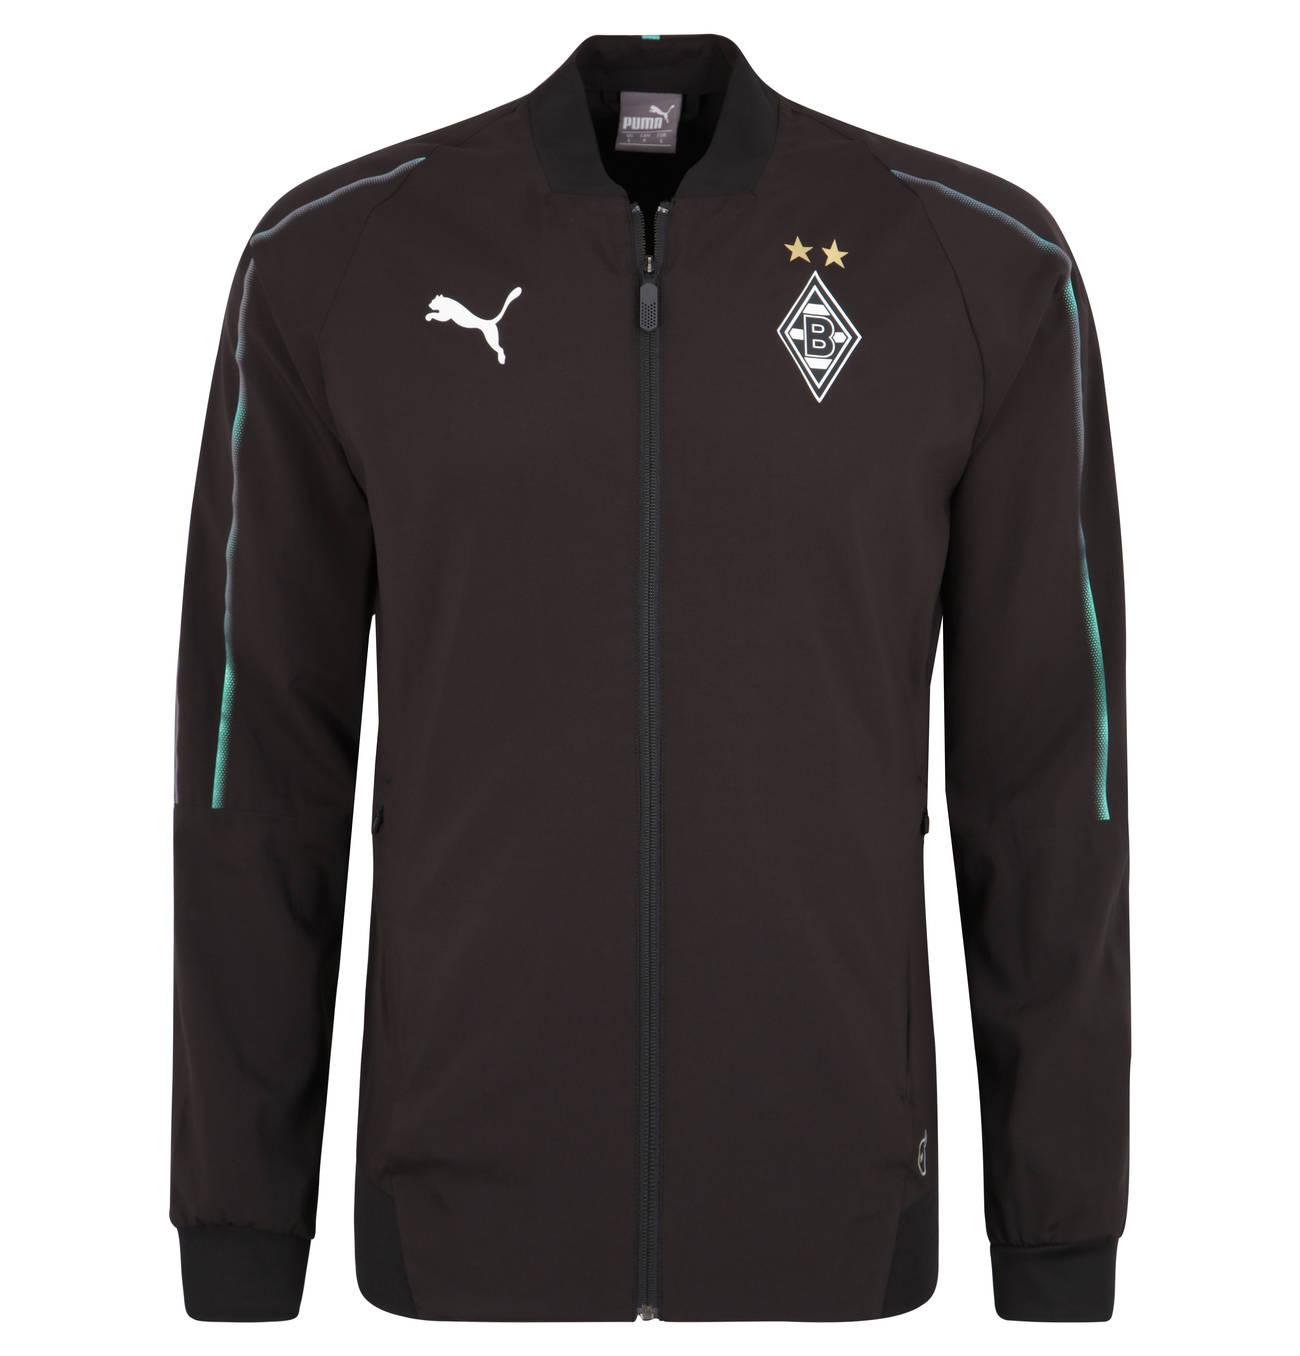 Borussia Mönchengladbach Trainingsjacke, 20182019, für